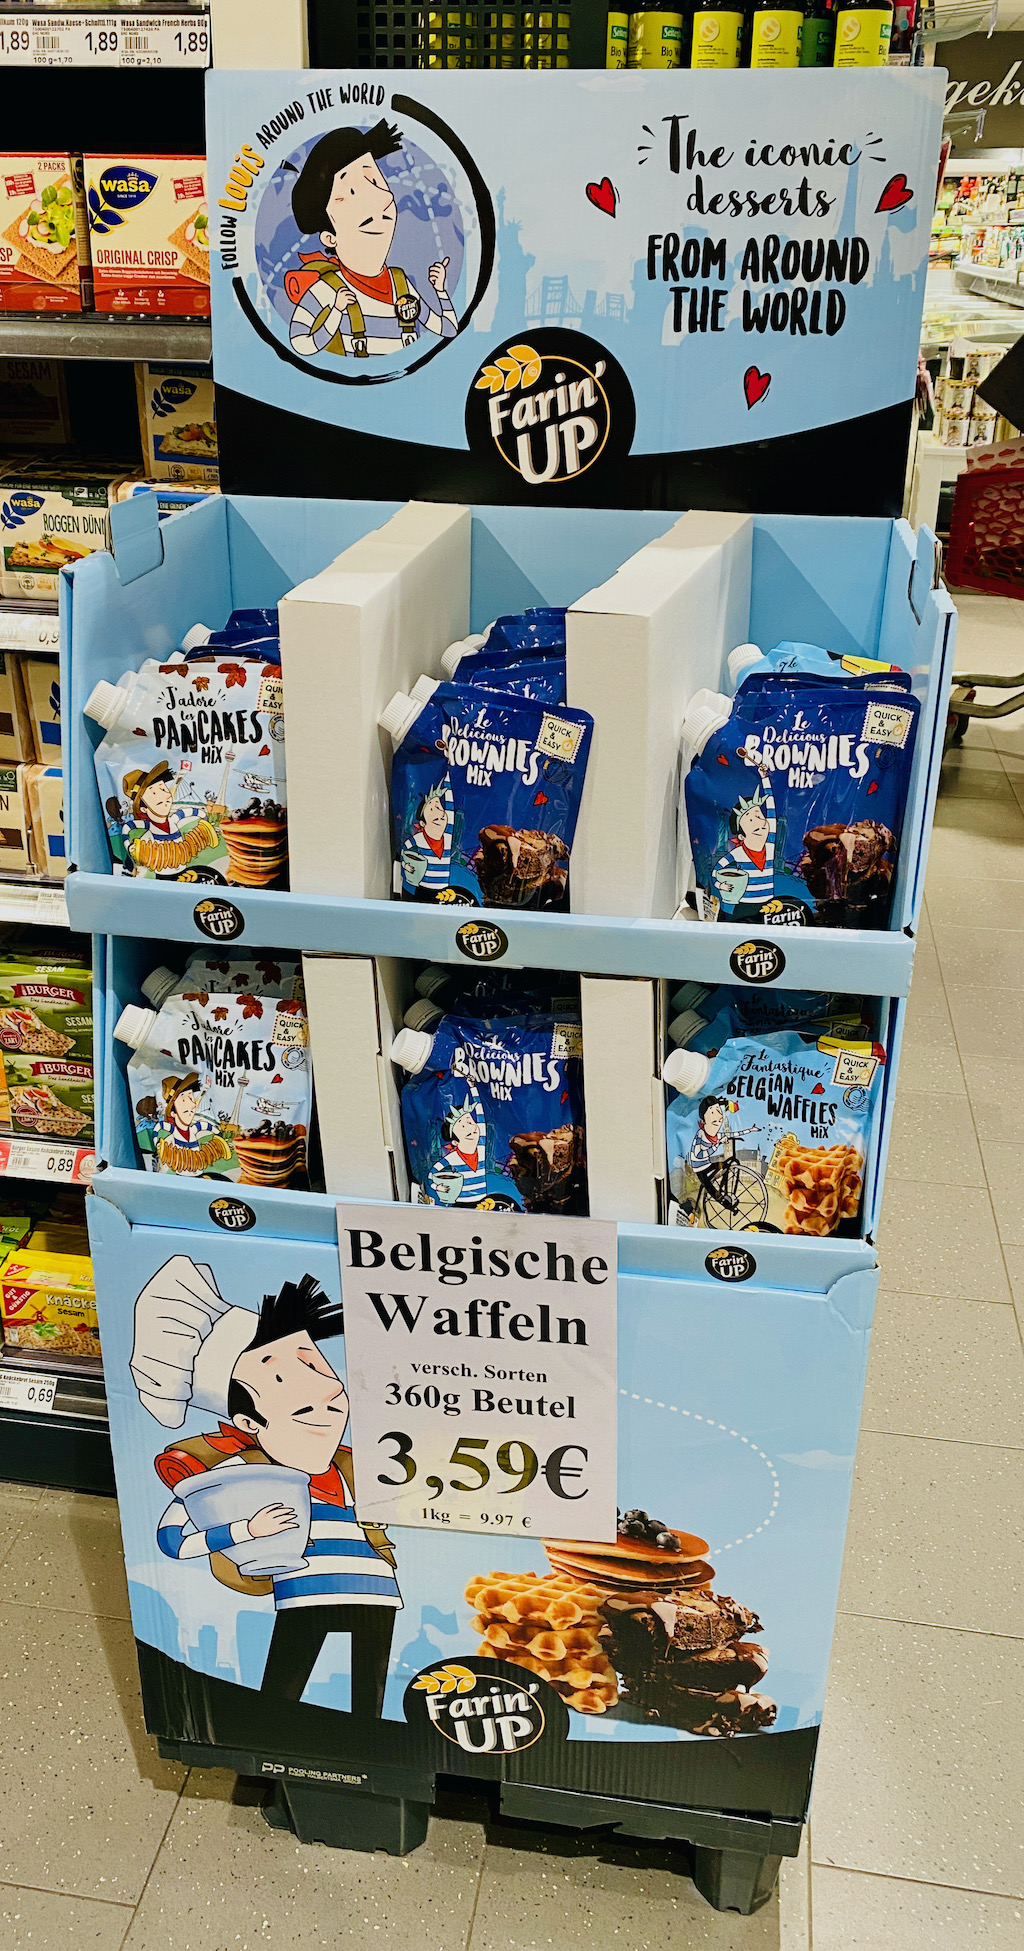 Genuport Farin up Fertigteige Pancakes-Brownies-Belgische Waffeln